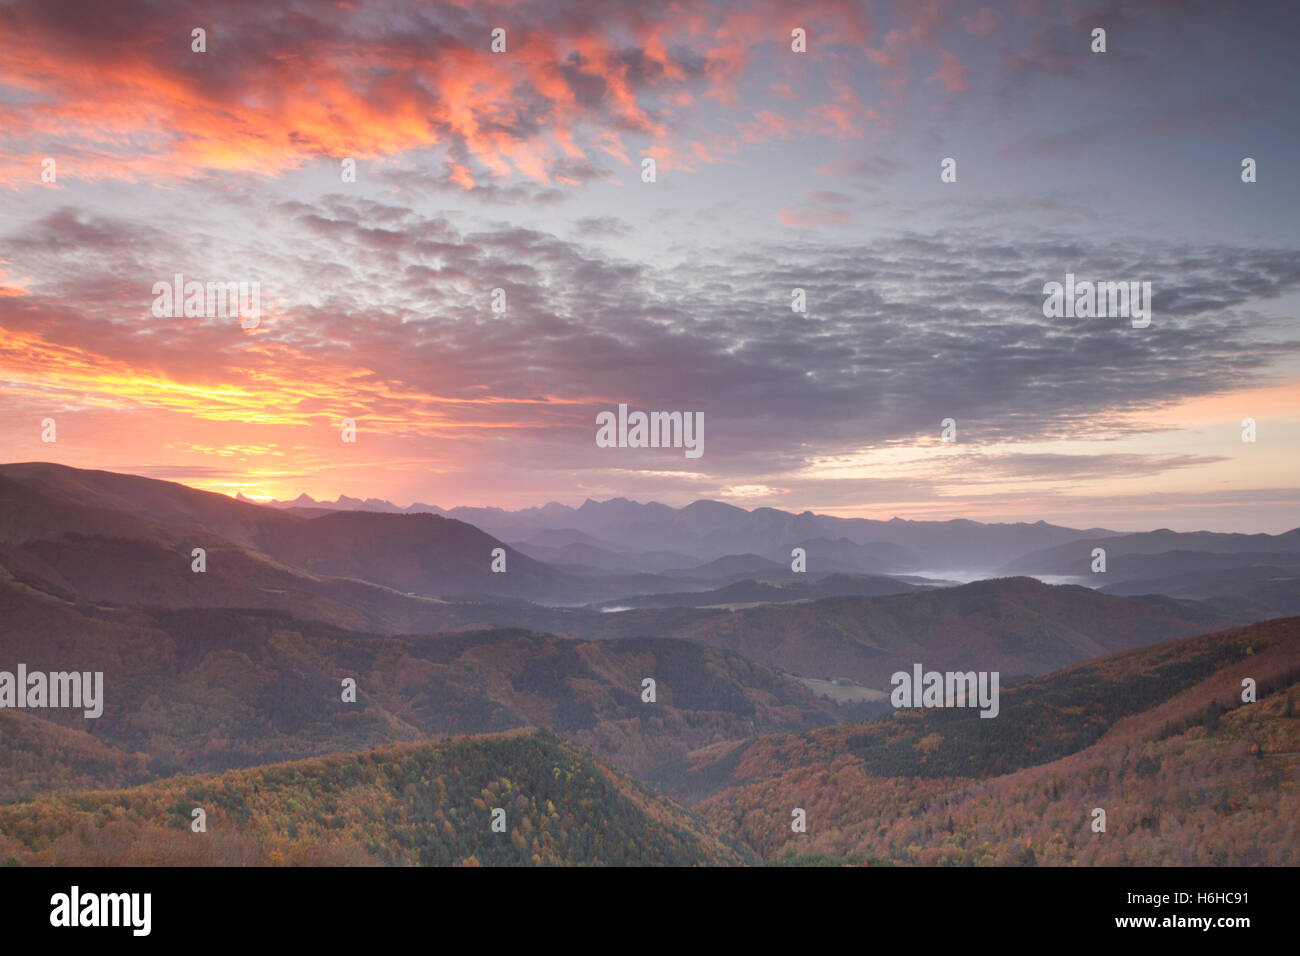 Autumn in Pikatua viewer, Navarre, Spain. - Stock Image